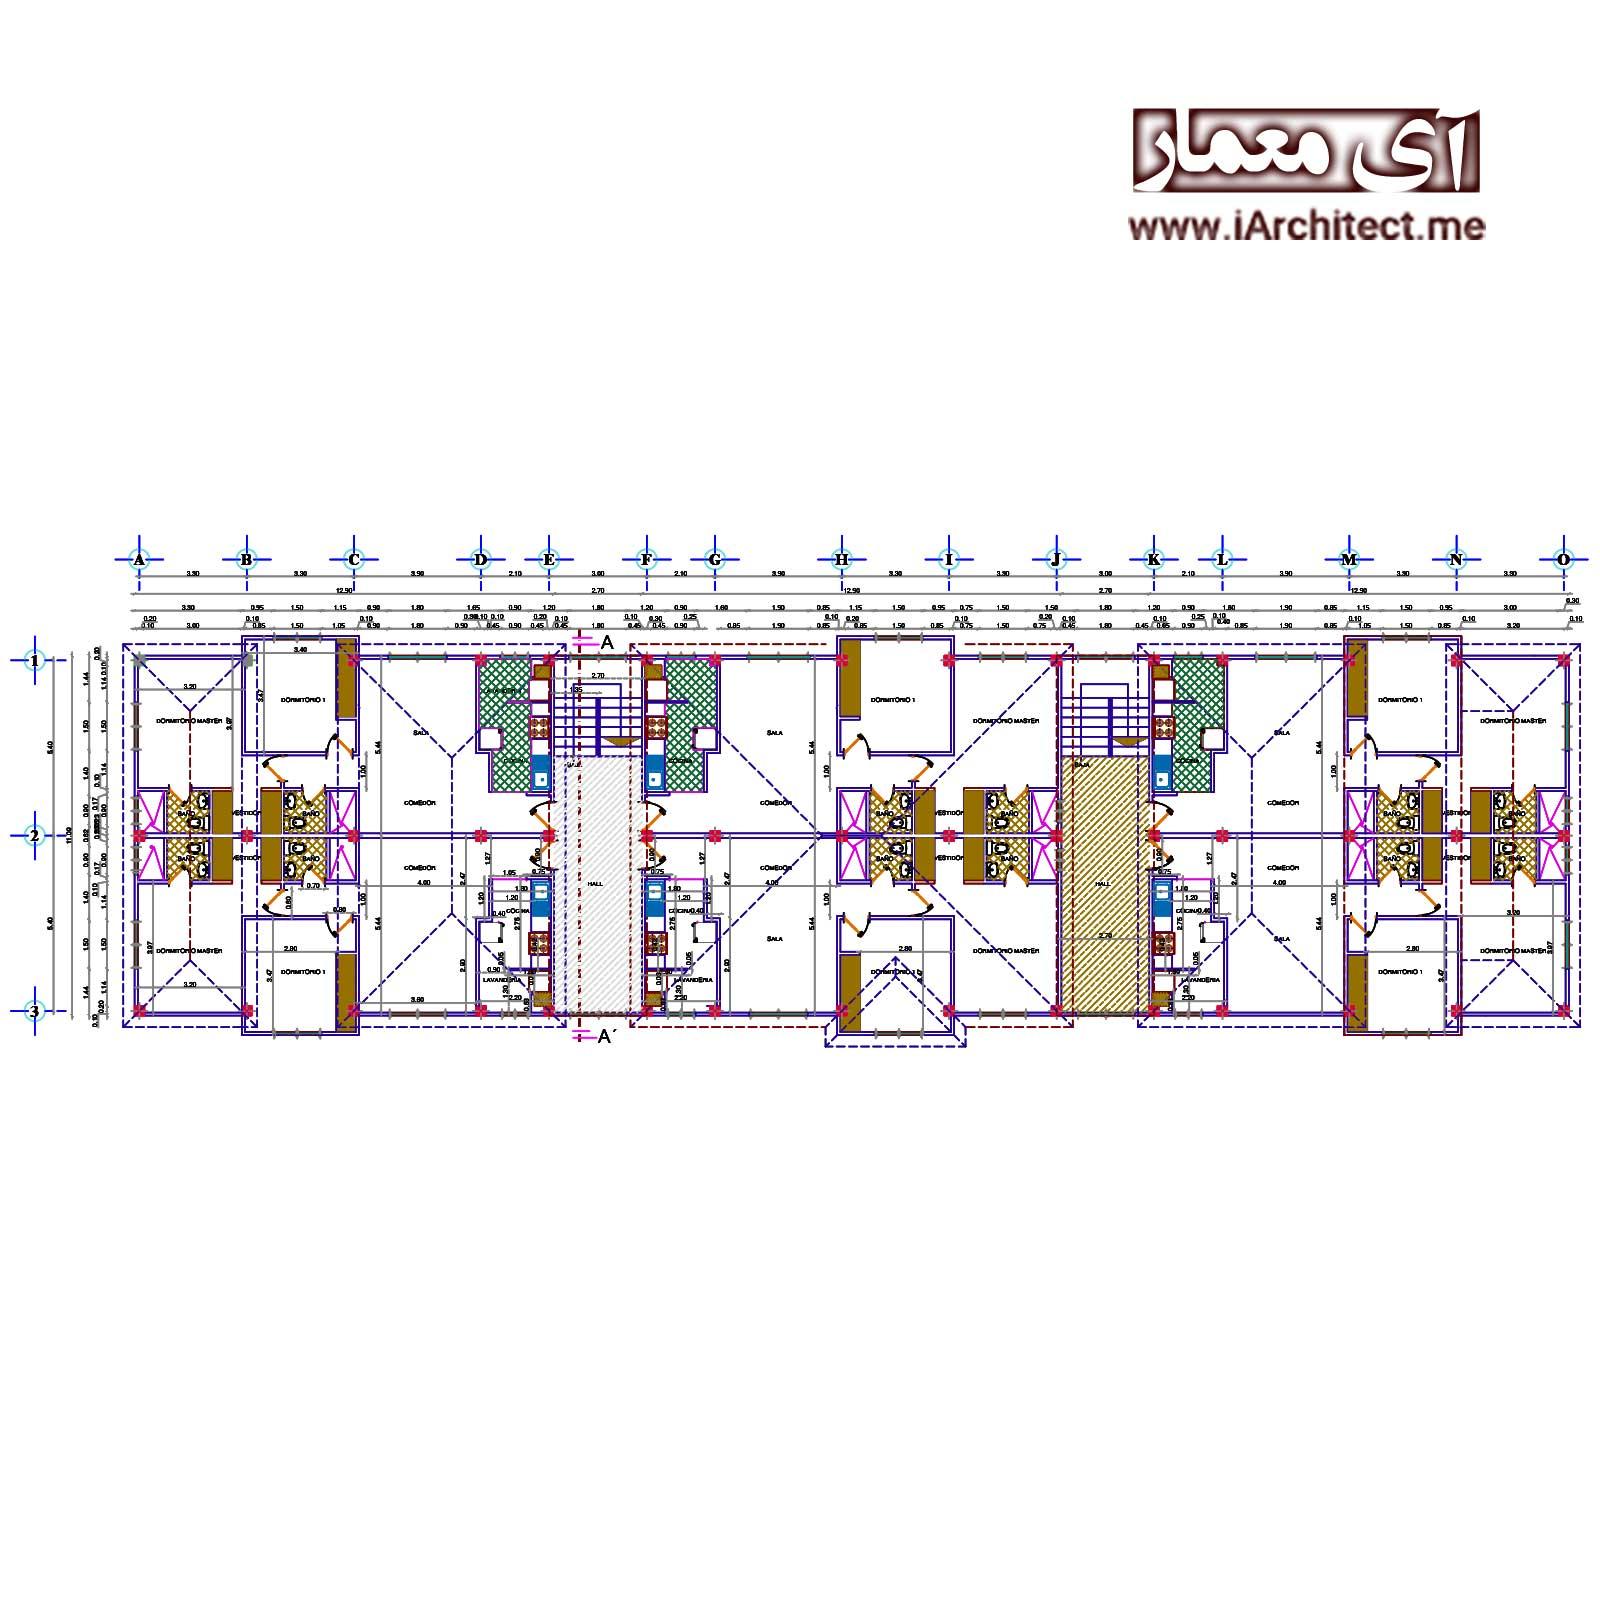 نقشه آپارتمان مسکونی عرض 11